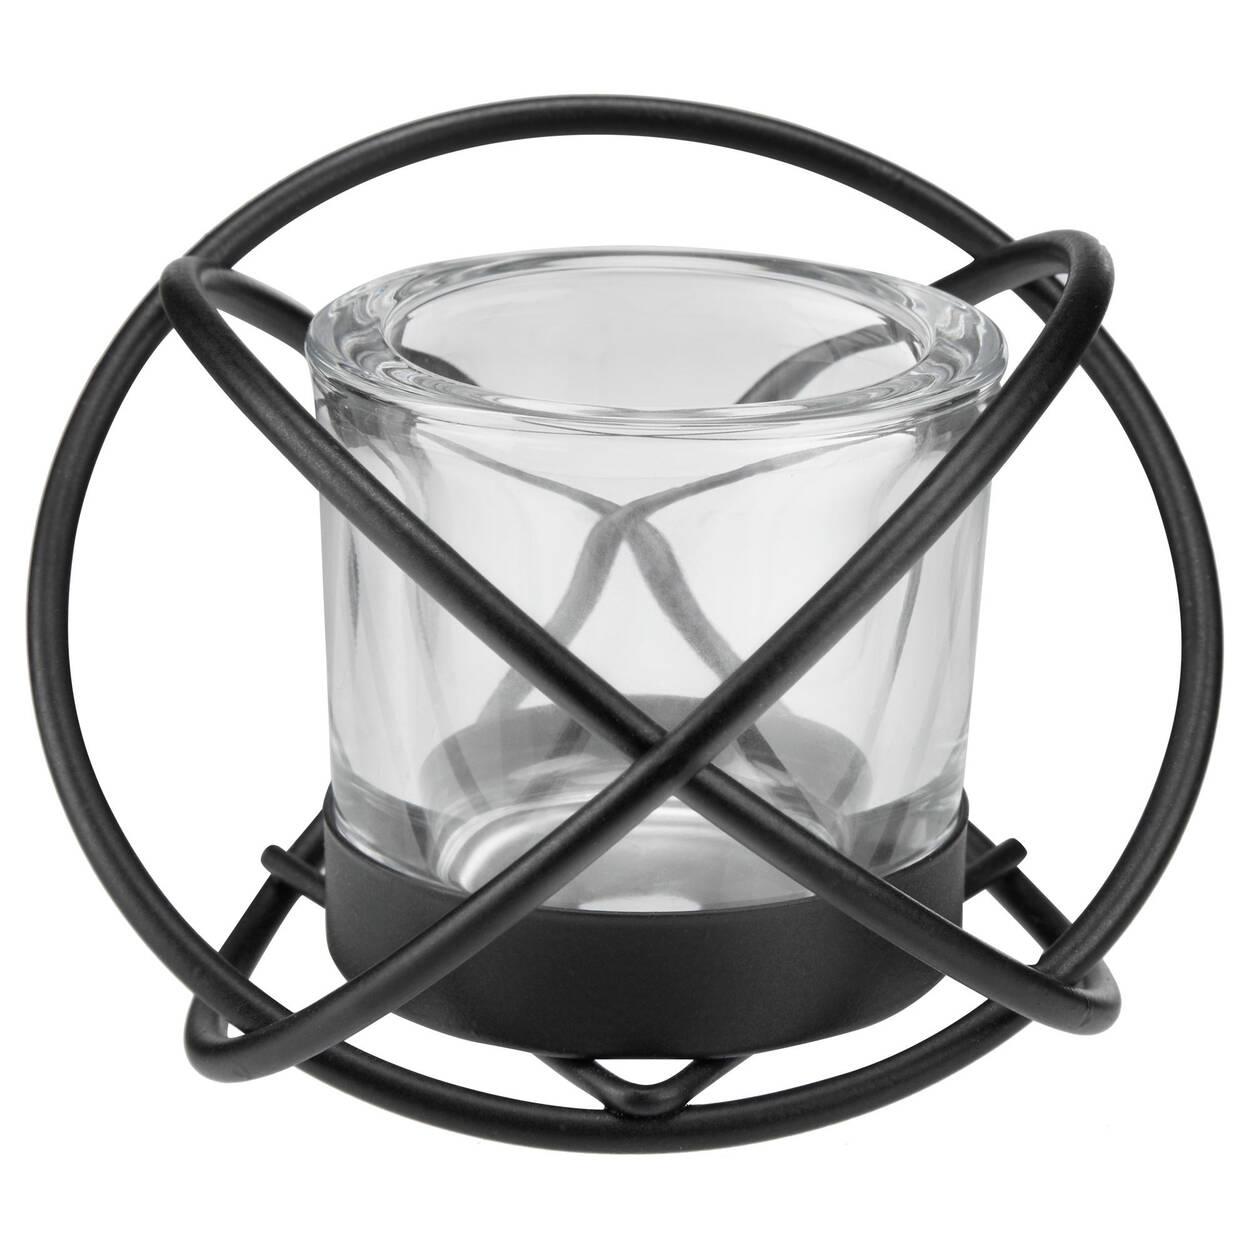 Iron Wire & Glass Tea Light Holder